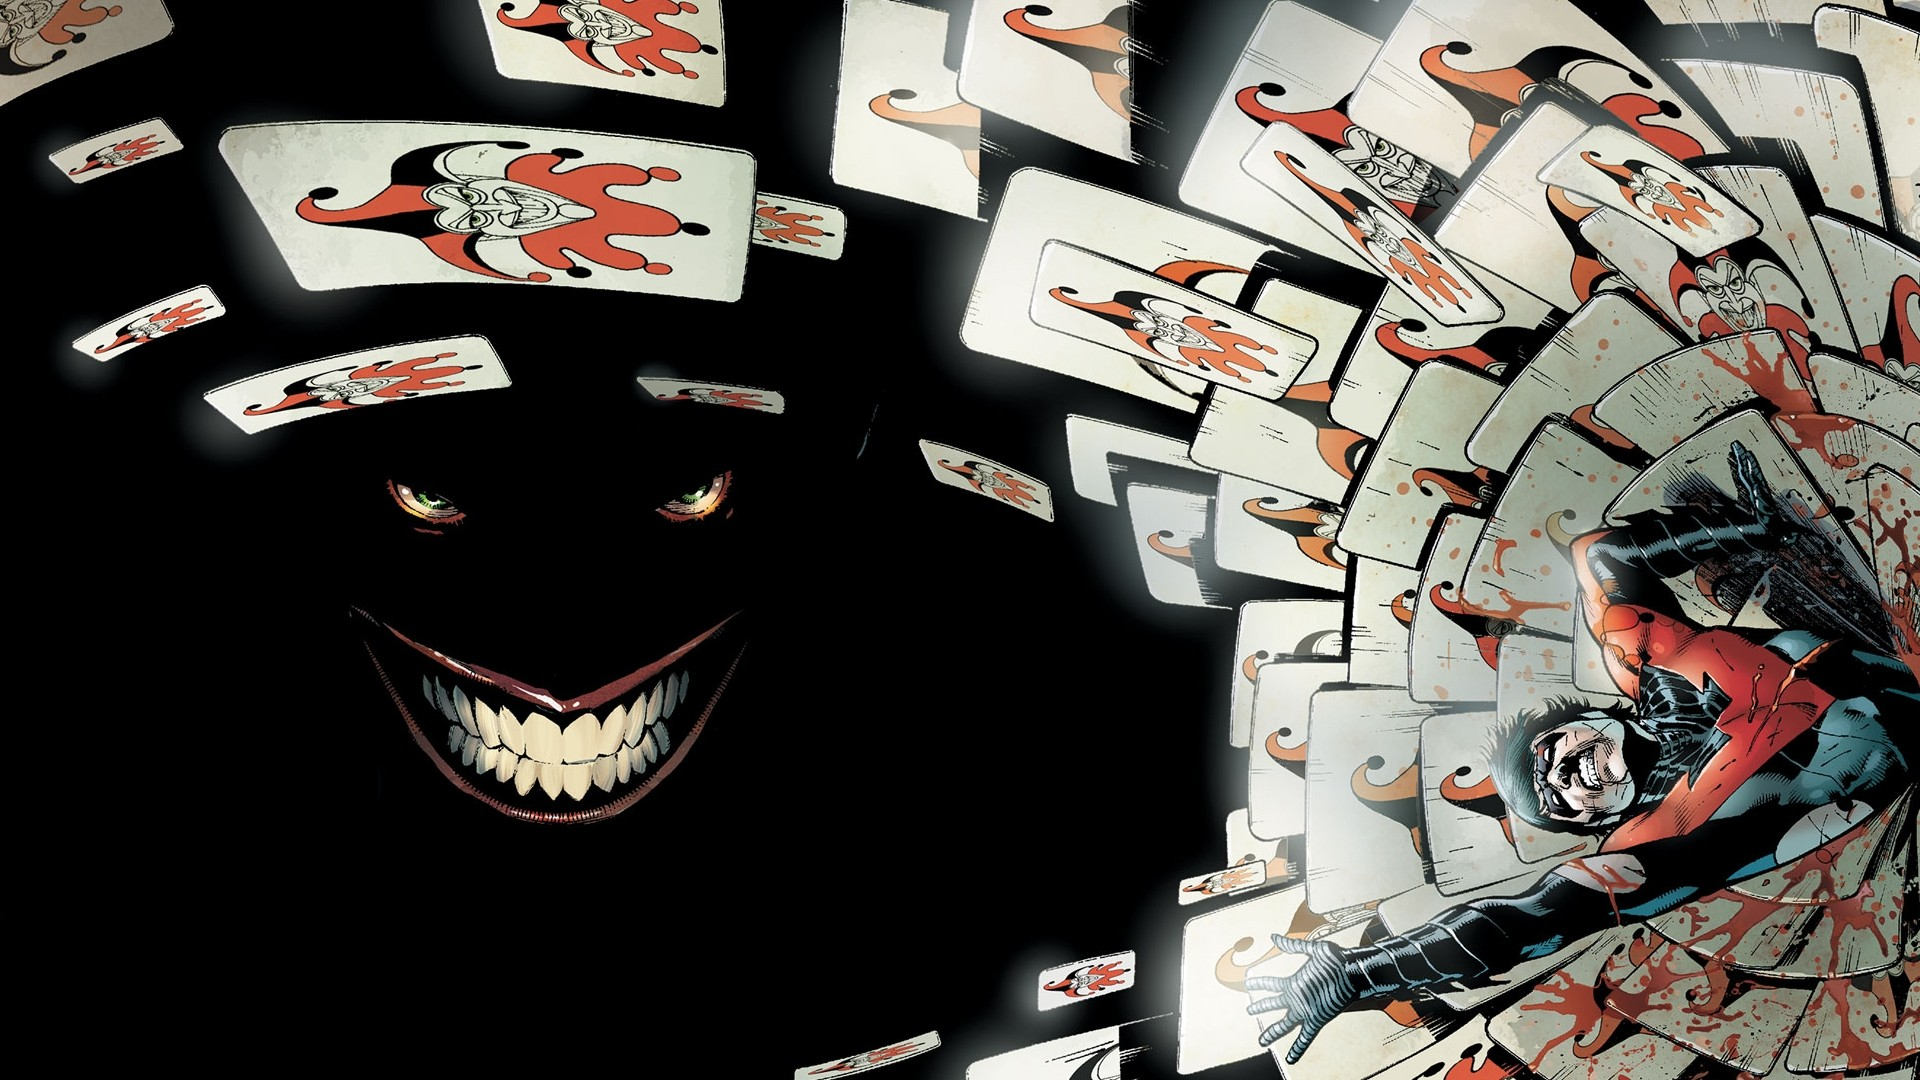 Image Gallery: joker card wallpaper